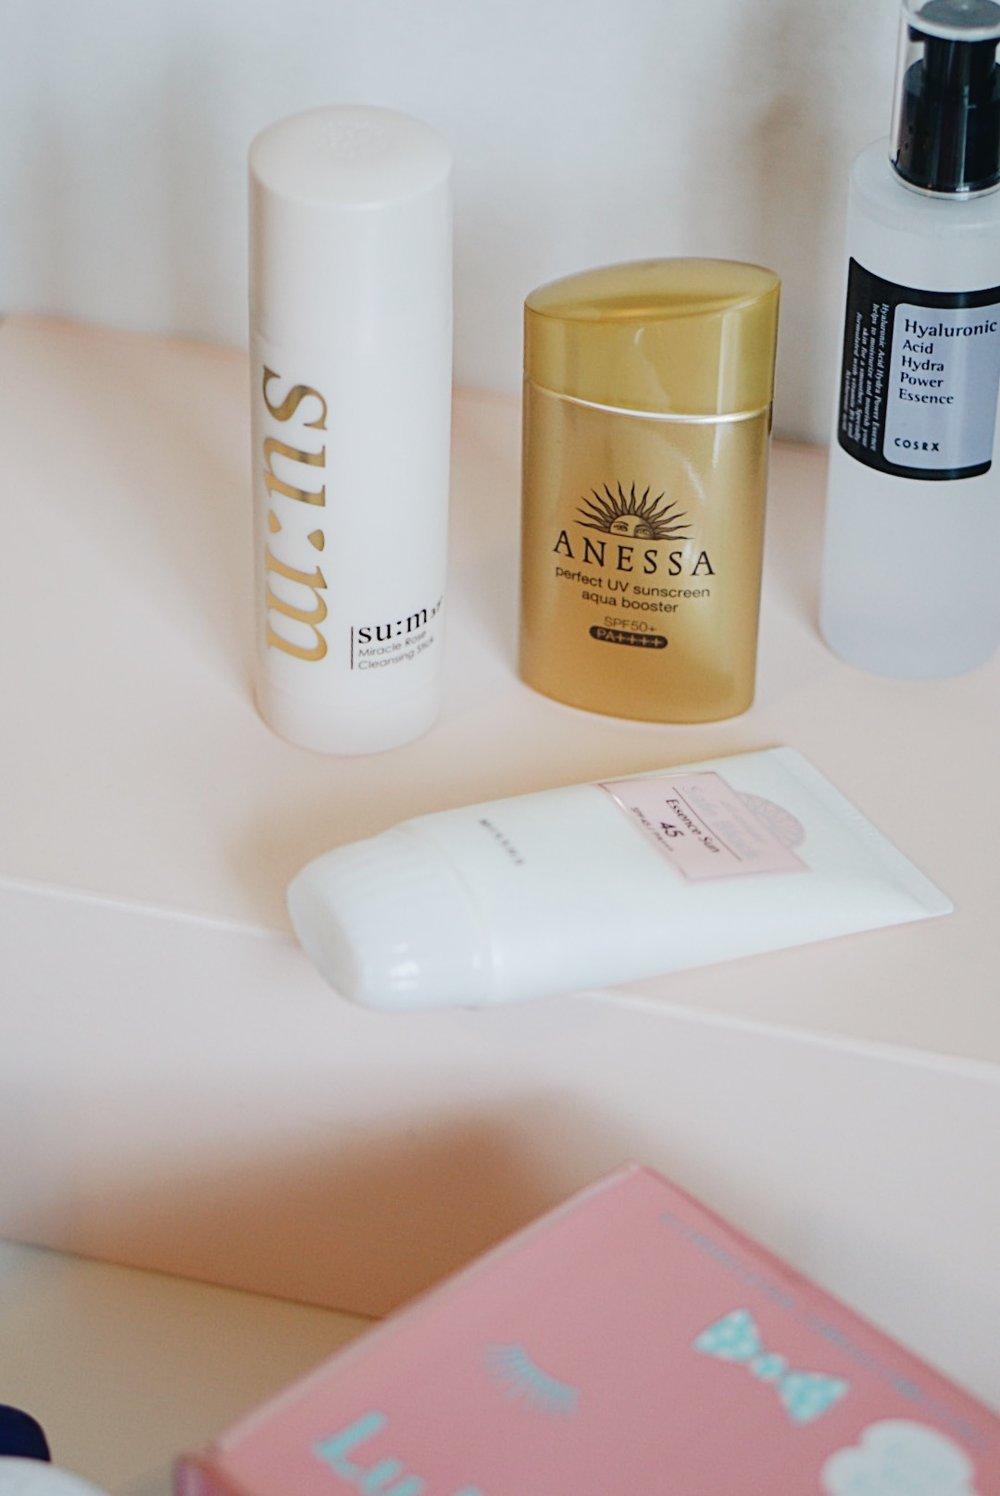 Asian Skincare To Buy: Sum37, Anessa, Missha, Lululun, cosrx